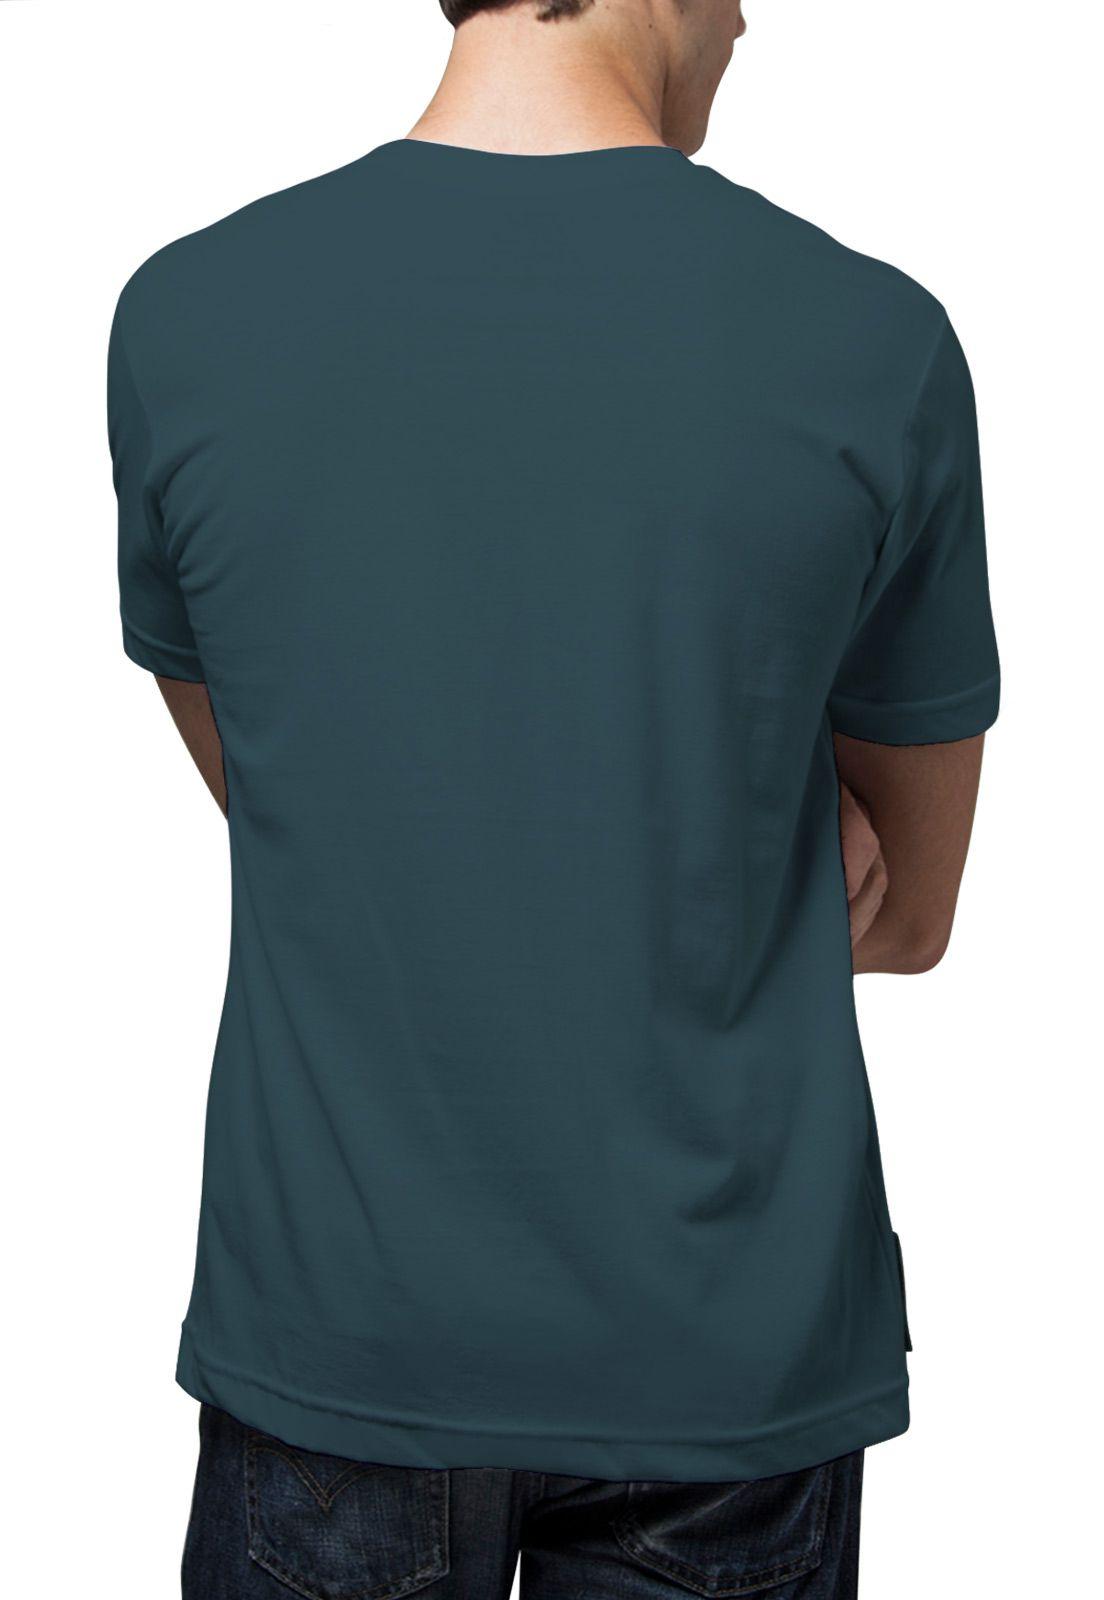 Camiseta Amazônia Lobo - Cinza Escuro